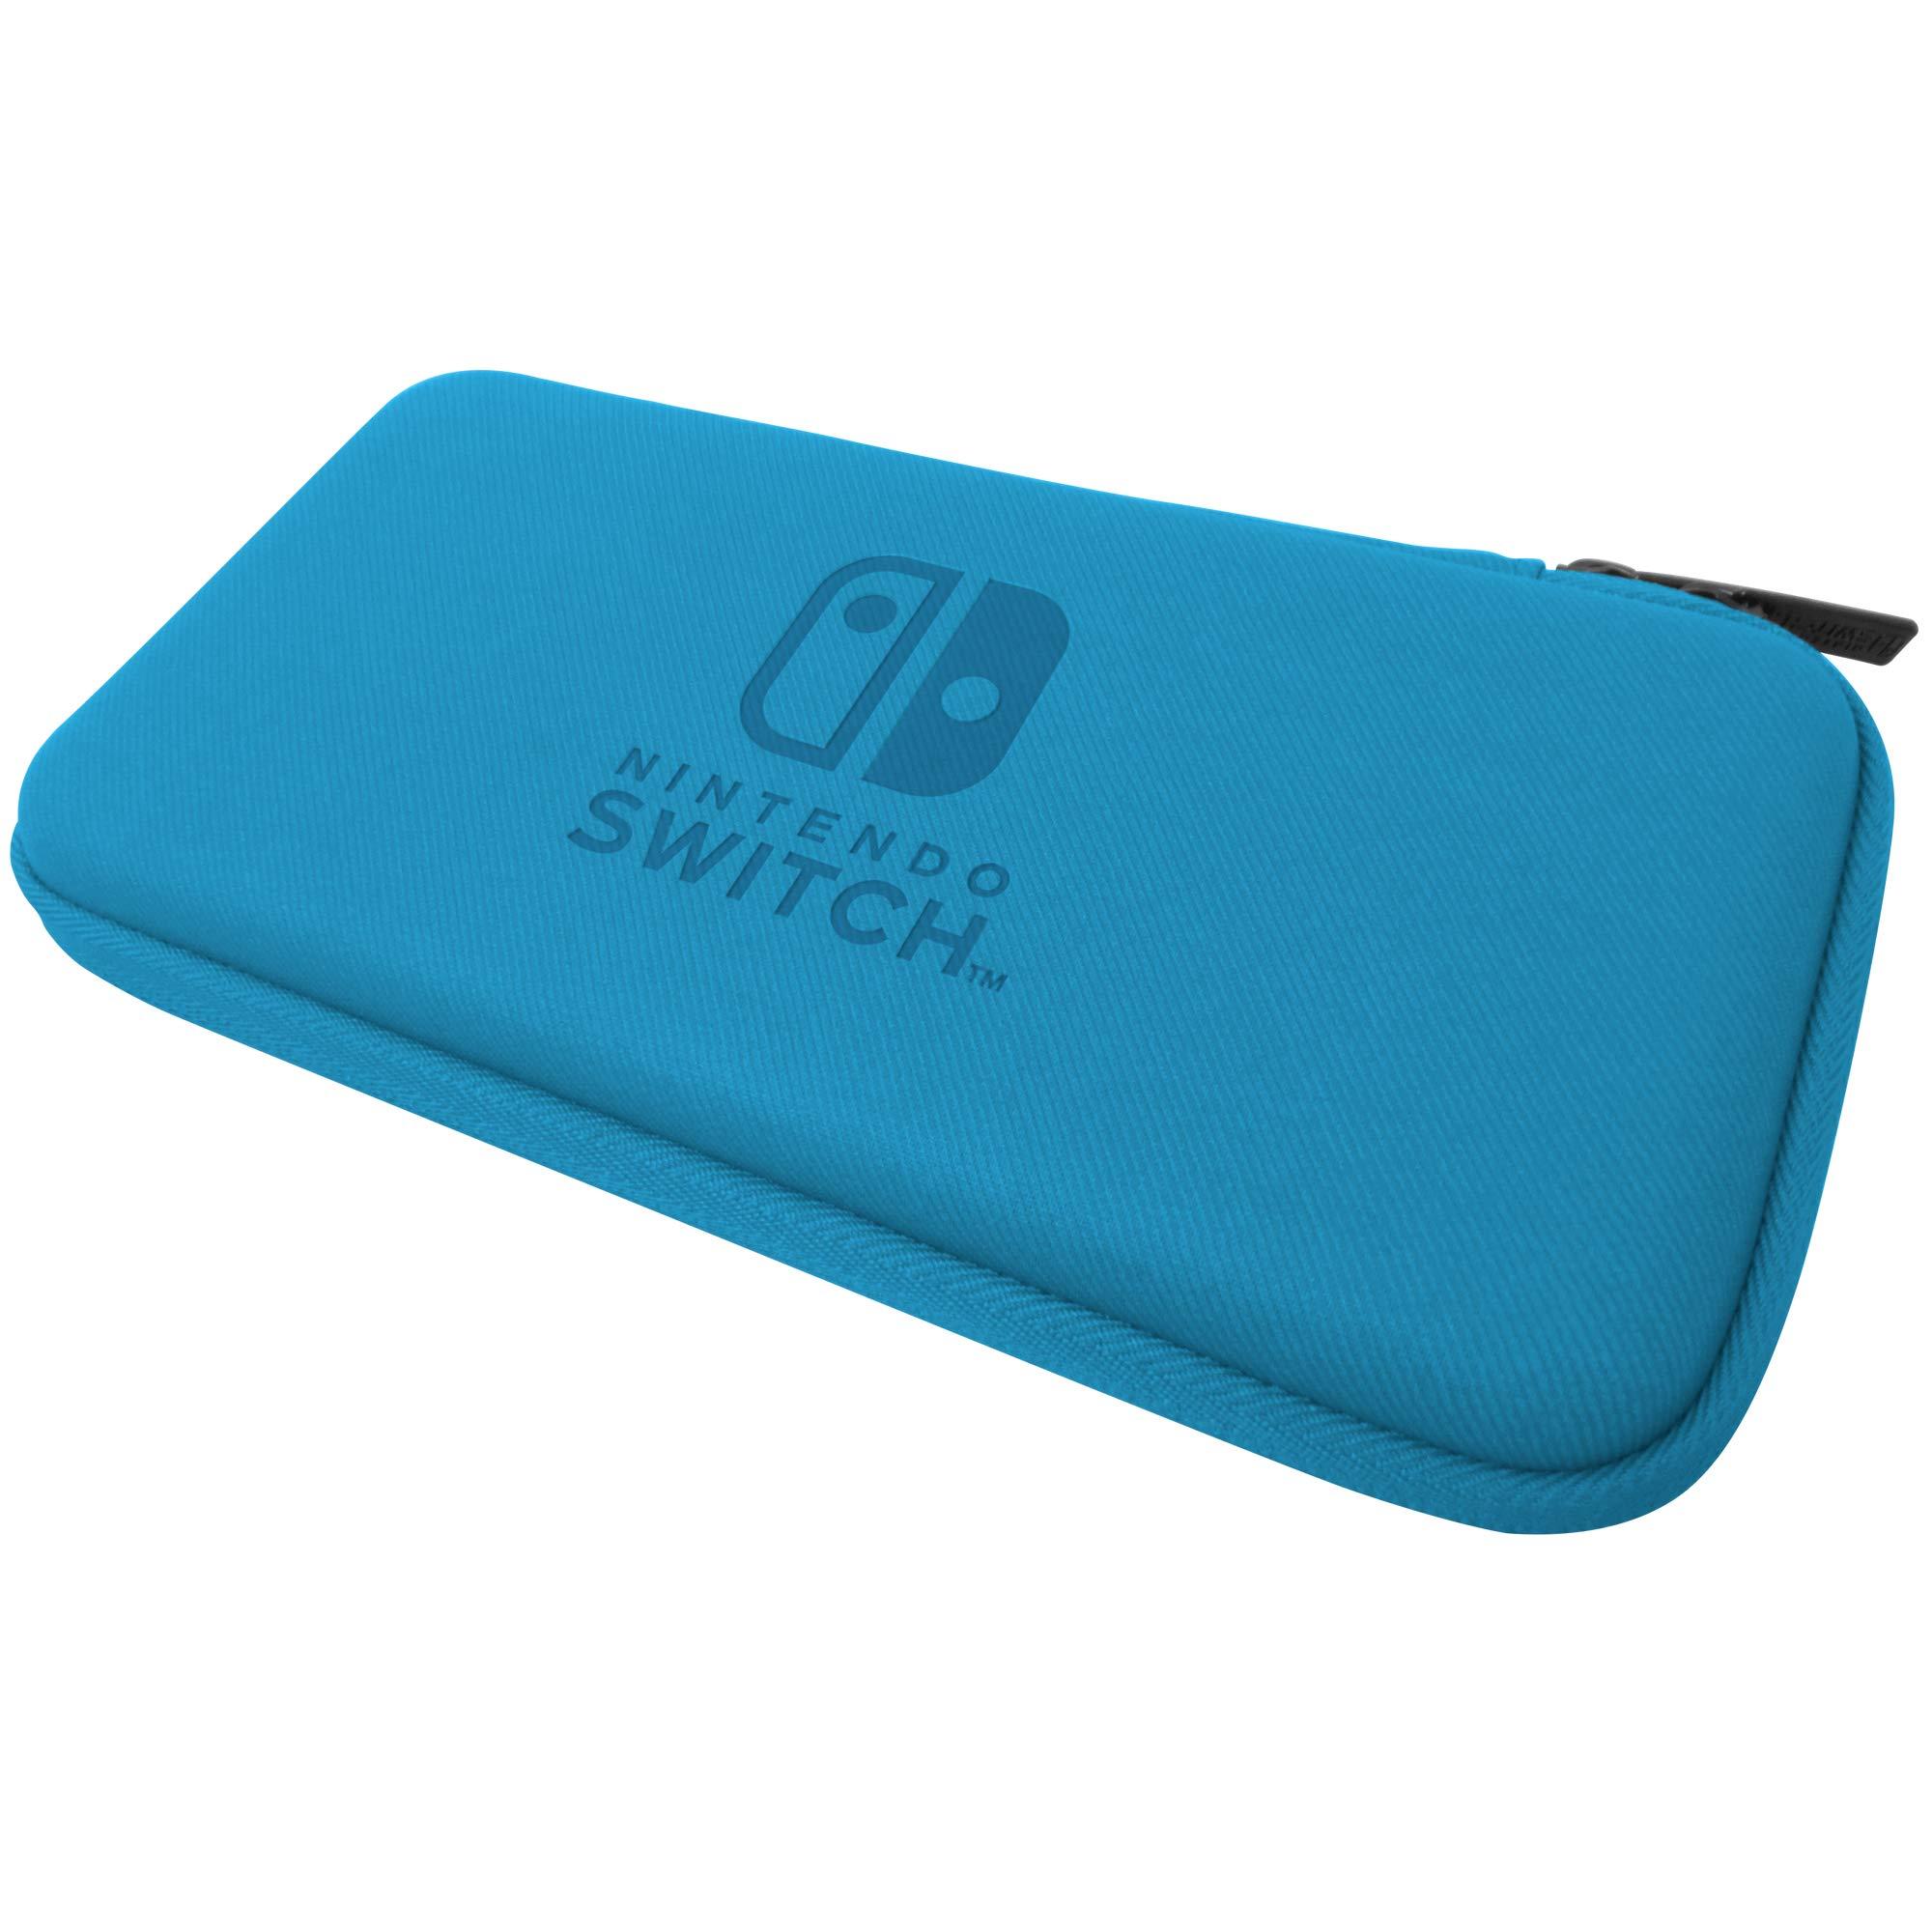 Hori - Funda Rígida Azul (Nintendo Switch Lite): Amazon.es: Videojuegos